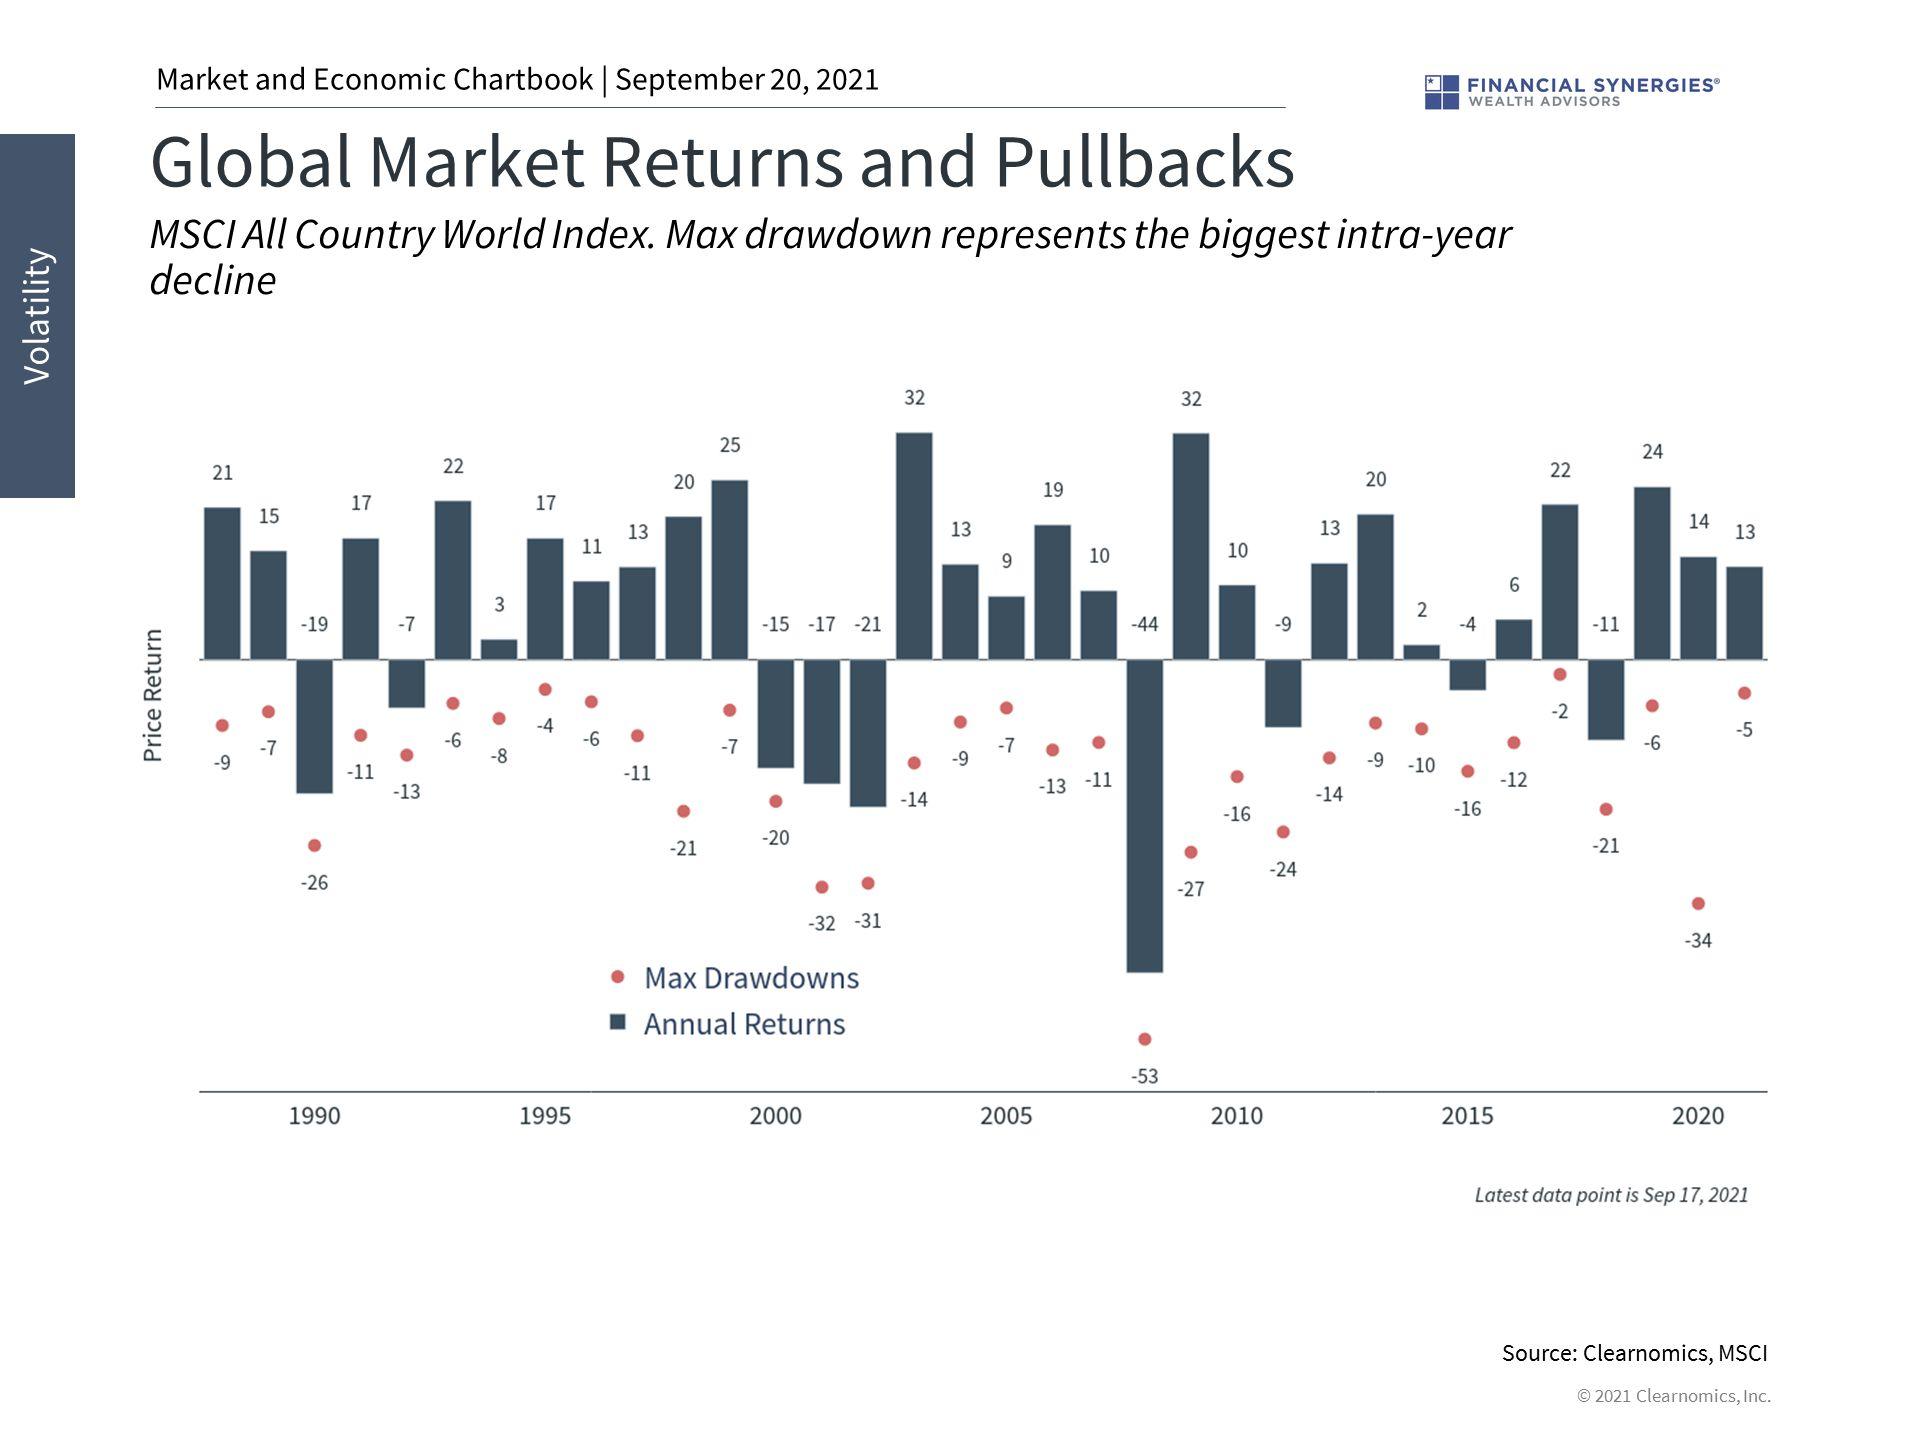 Global Market Returns and Pullbacks